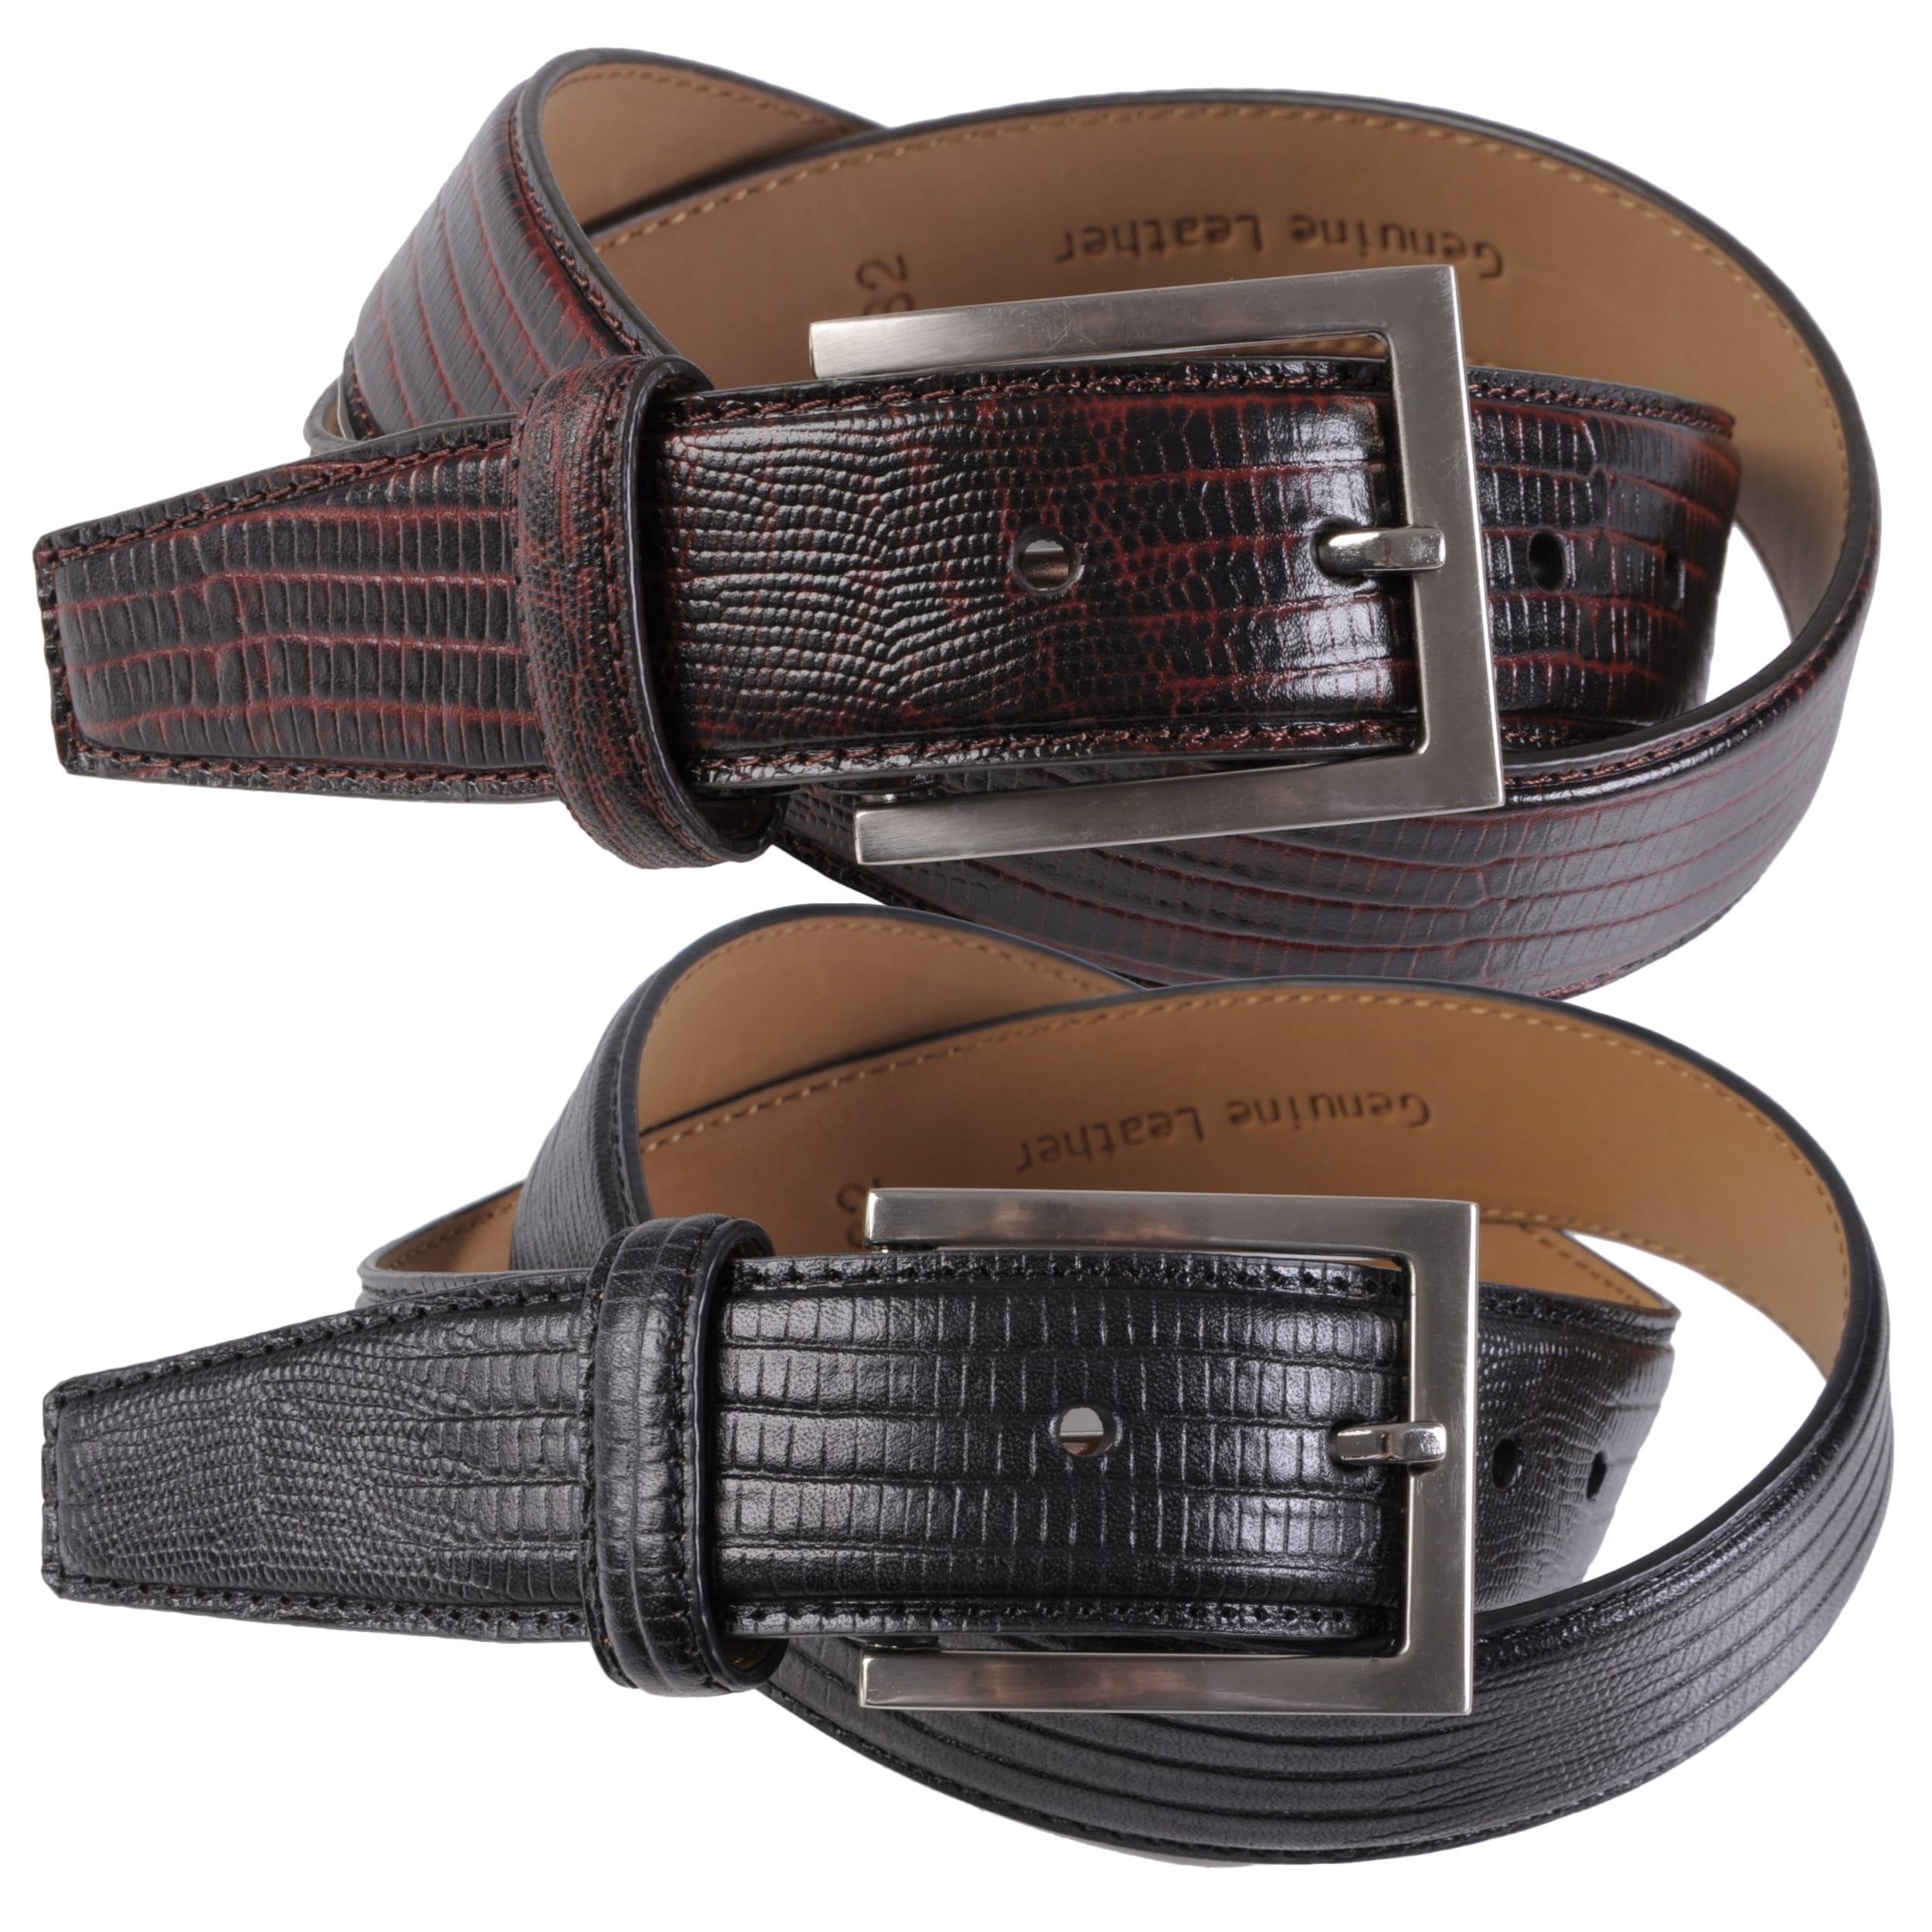 Joseph Abboud Men's Topstitched Croco Embossed Leather Belt